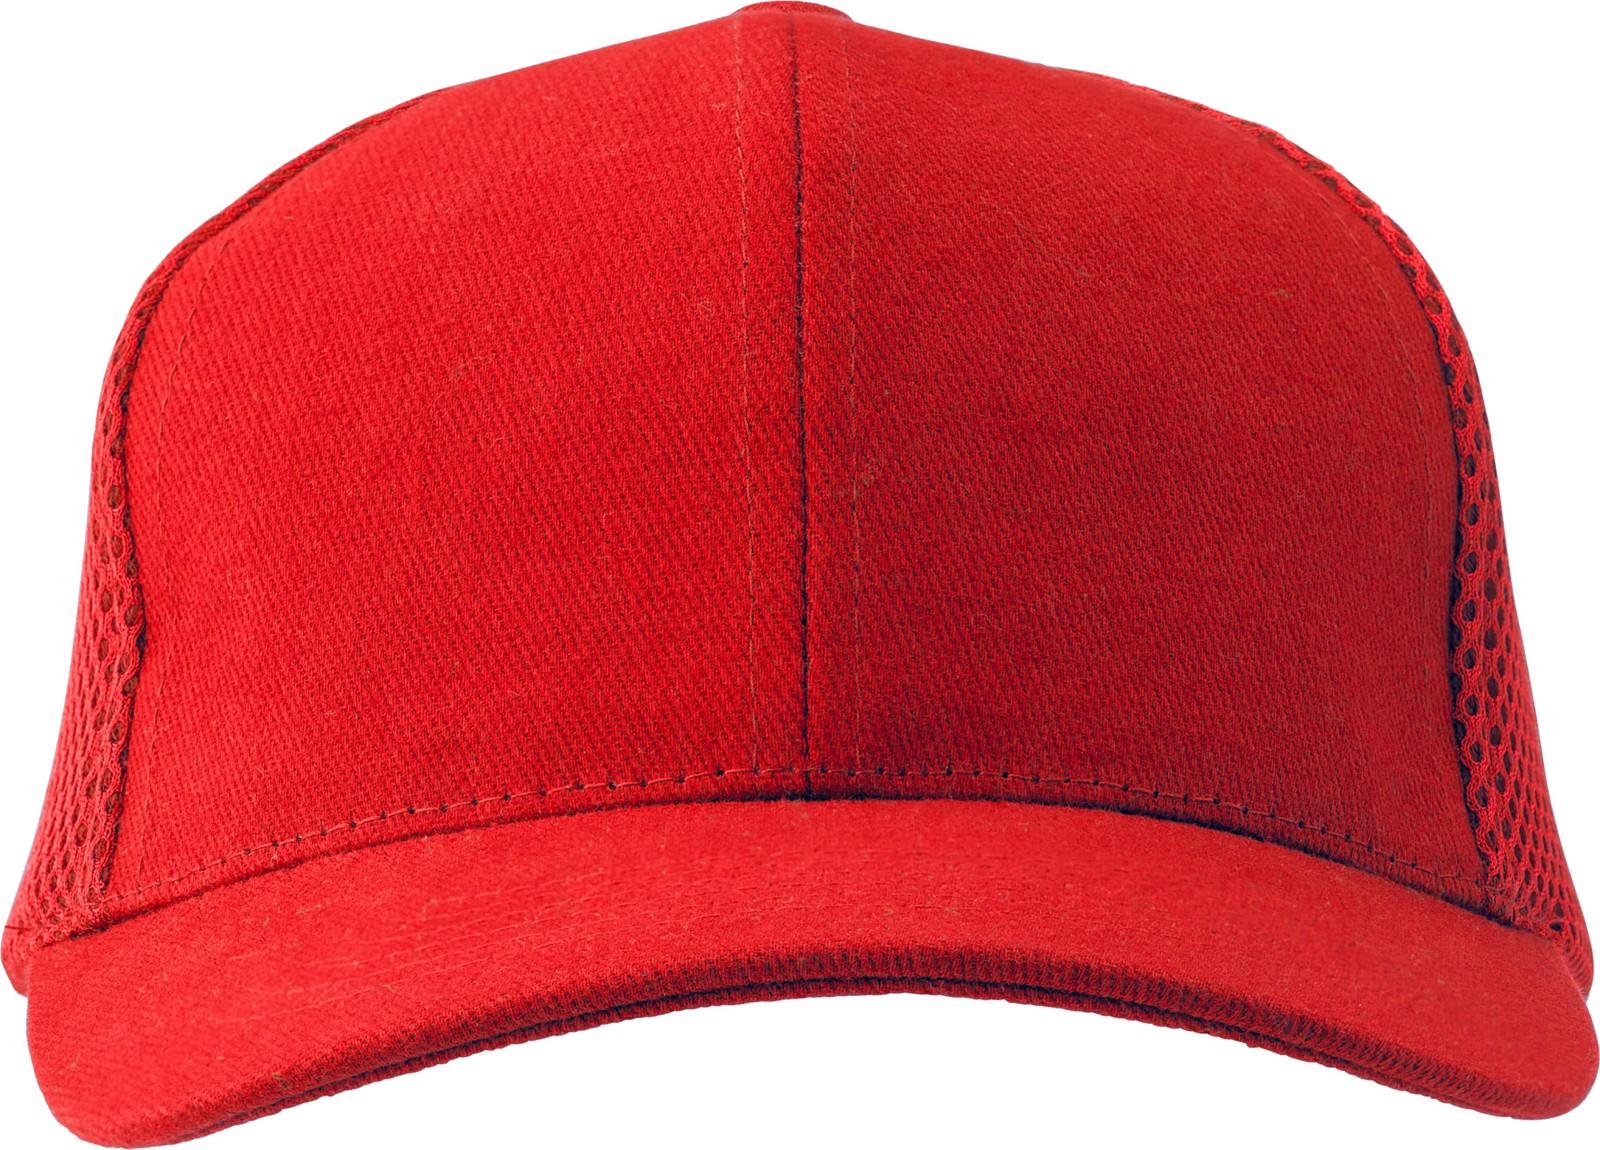 100% cotton twill cap - Red